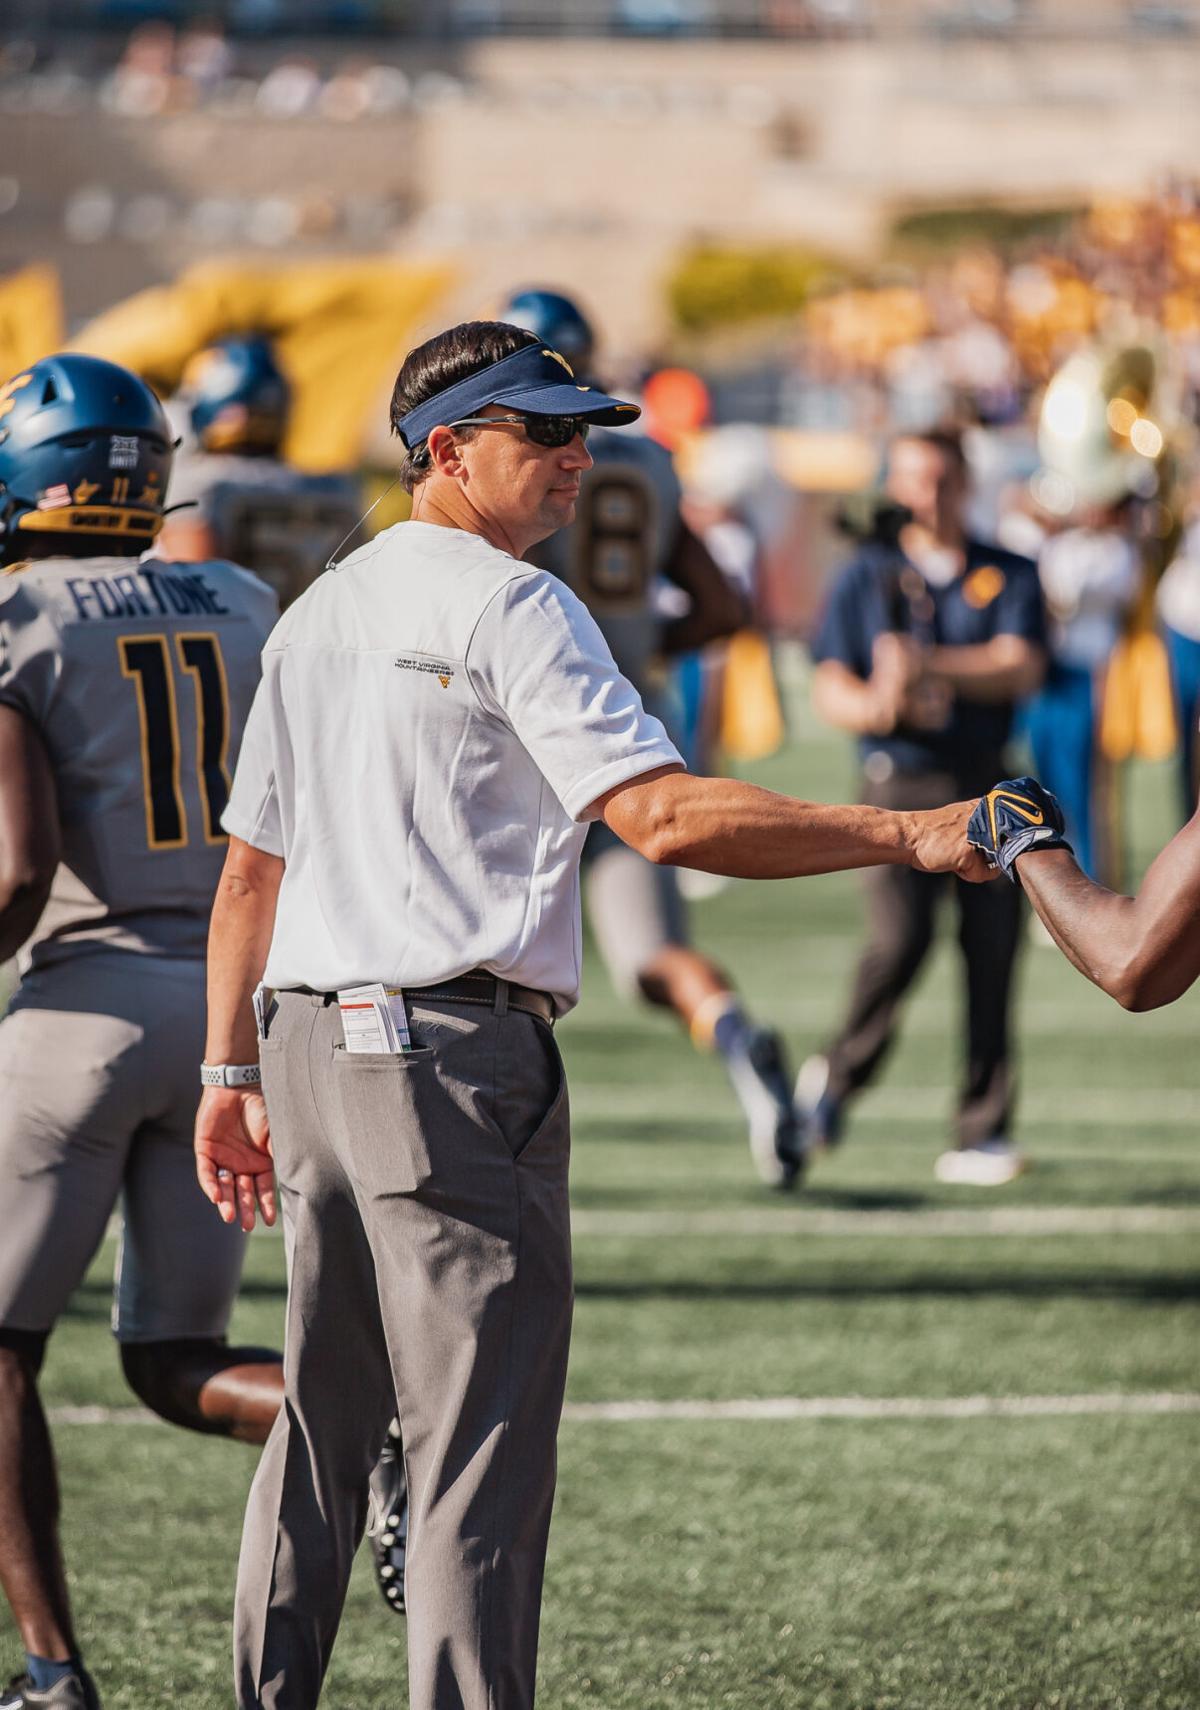 West Virginia head coach Neal Brown walks on the field prior to kickoff against Long Island at Milan Puskar Stadium in Morgantown, W.Va., on Sept. 11, 2021.